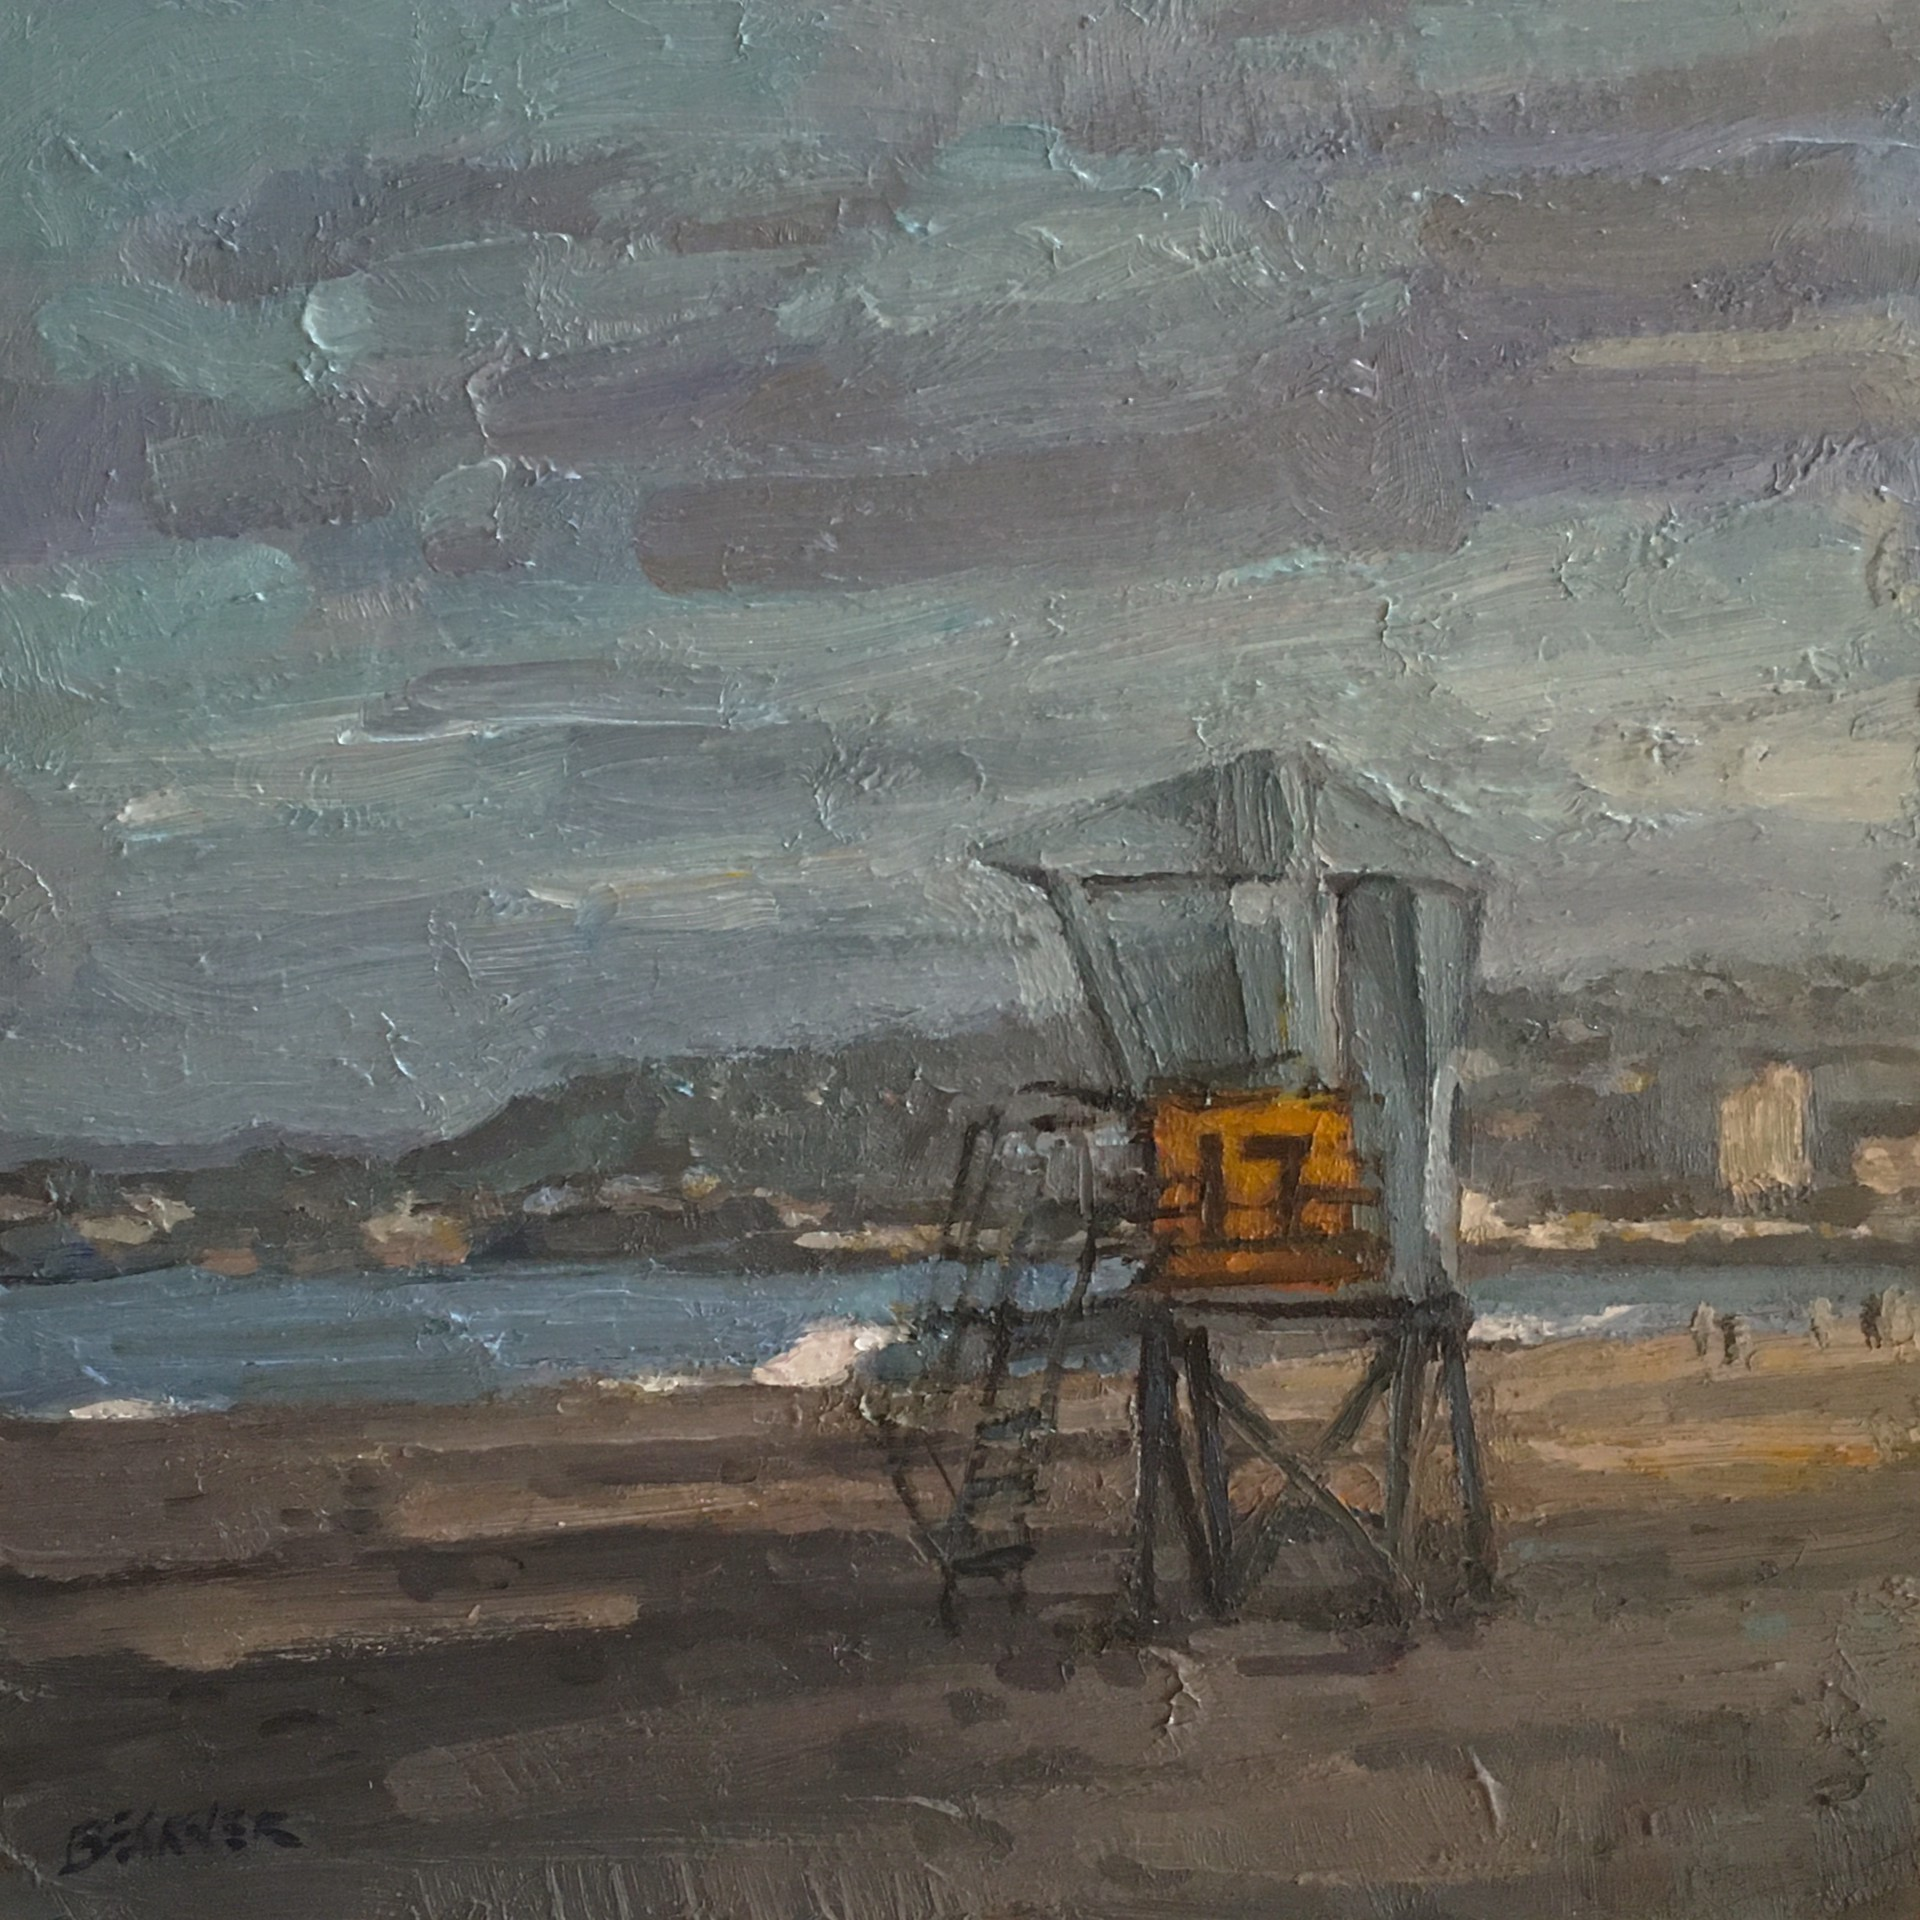 Beach 17 by Jim Beckner